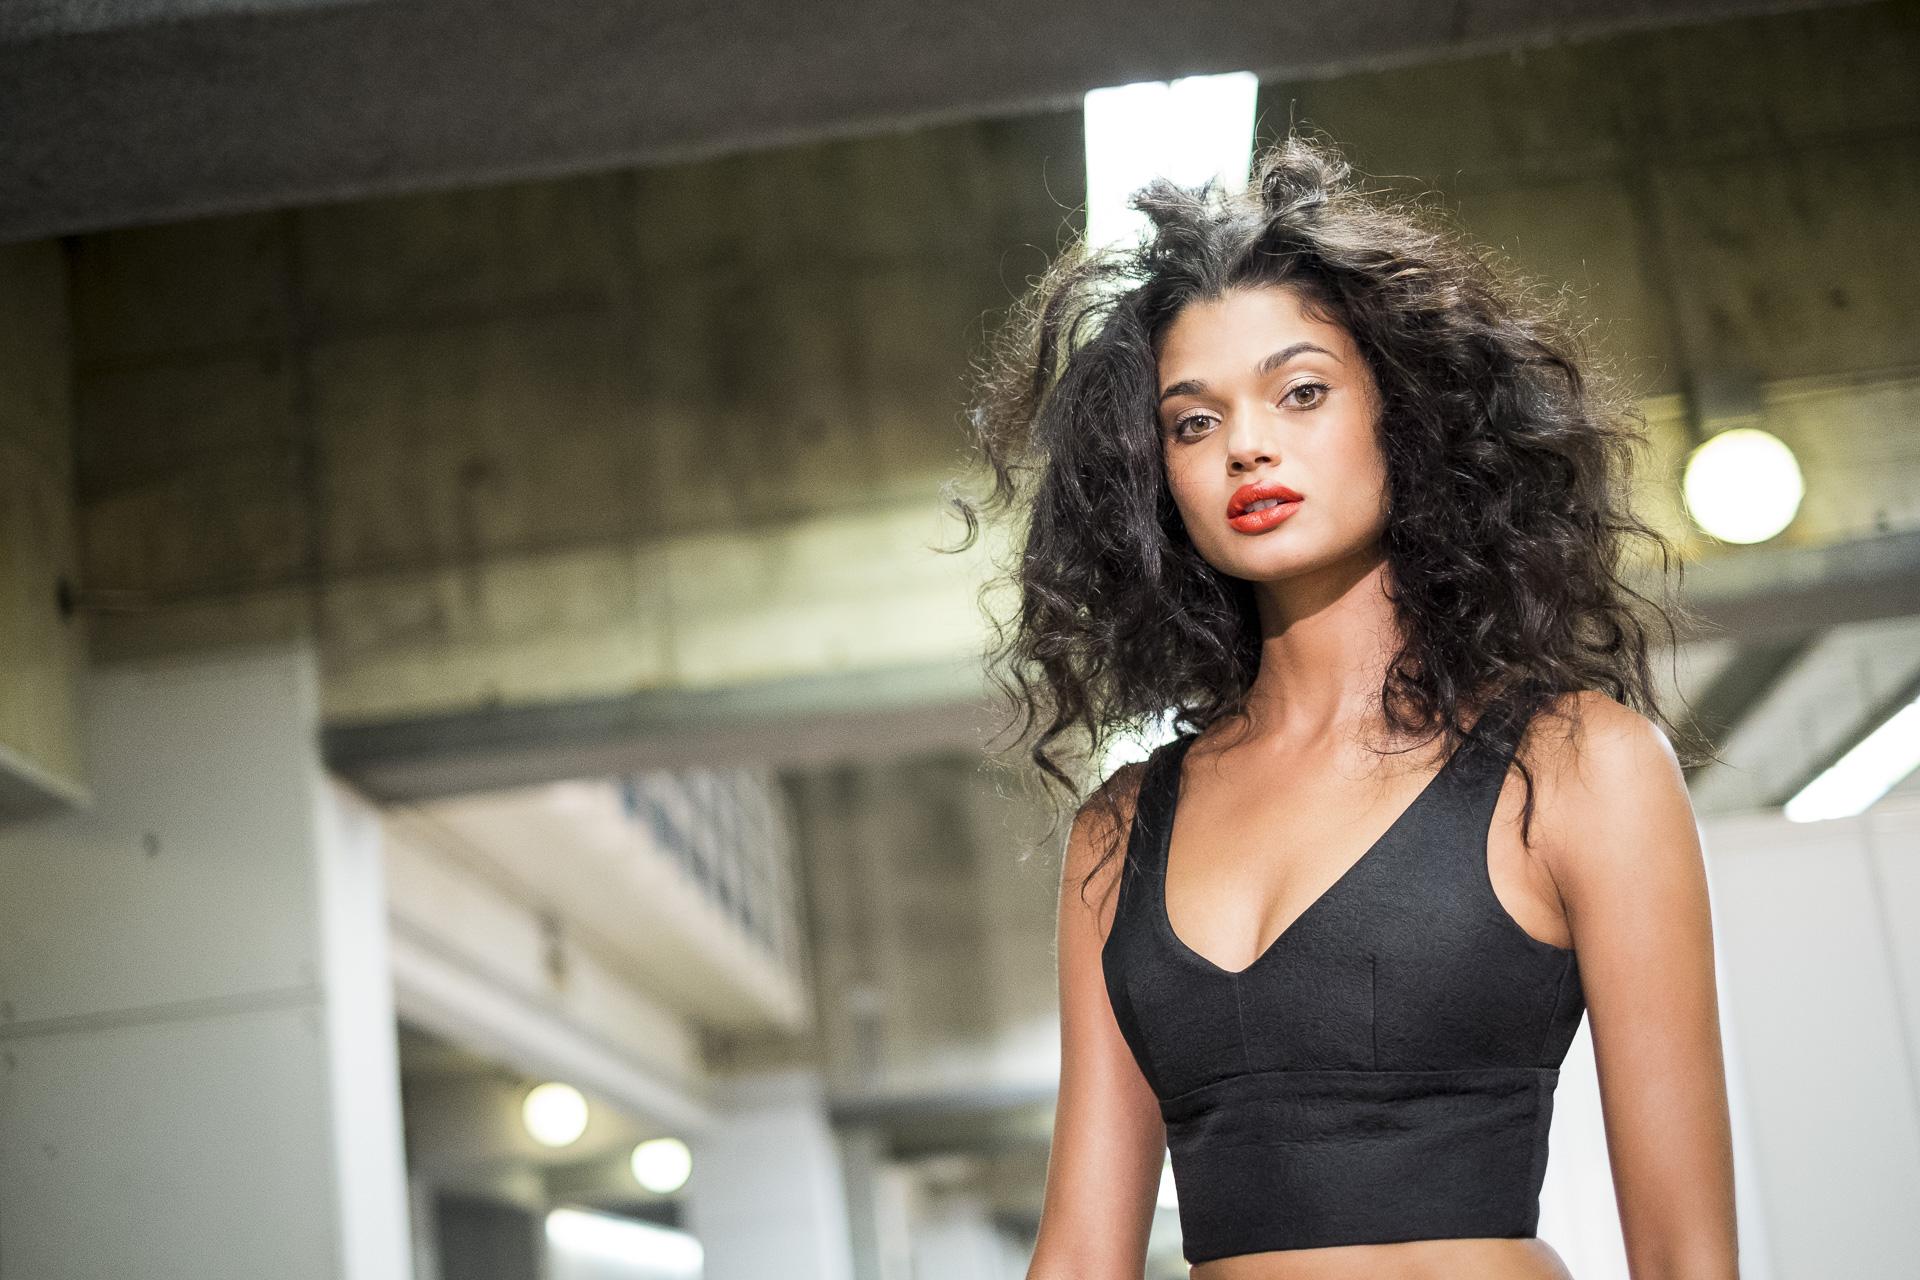 The brasilian model Daniela Braga poses for a portrait in the backstage